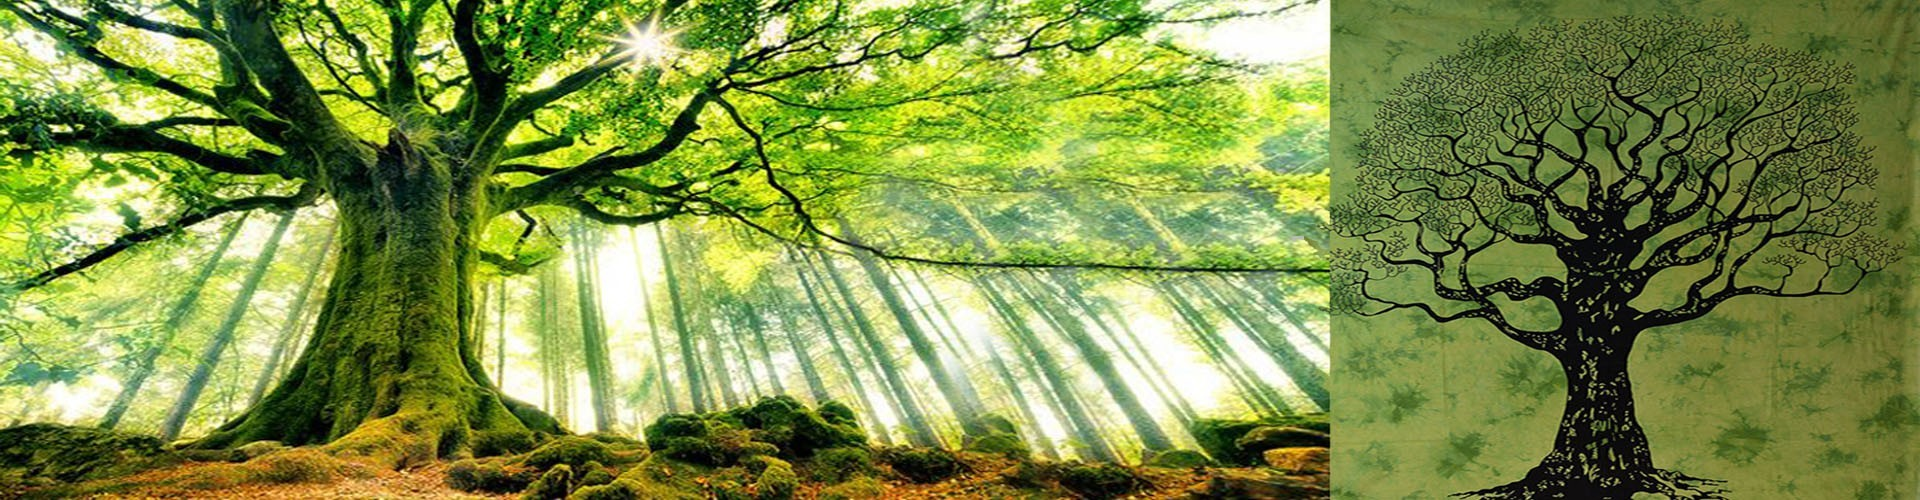 Tenture Arbre de Vie, la force de vie en déco, tenture arbre indienne